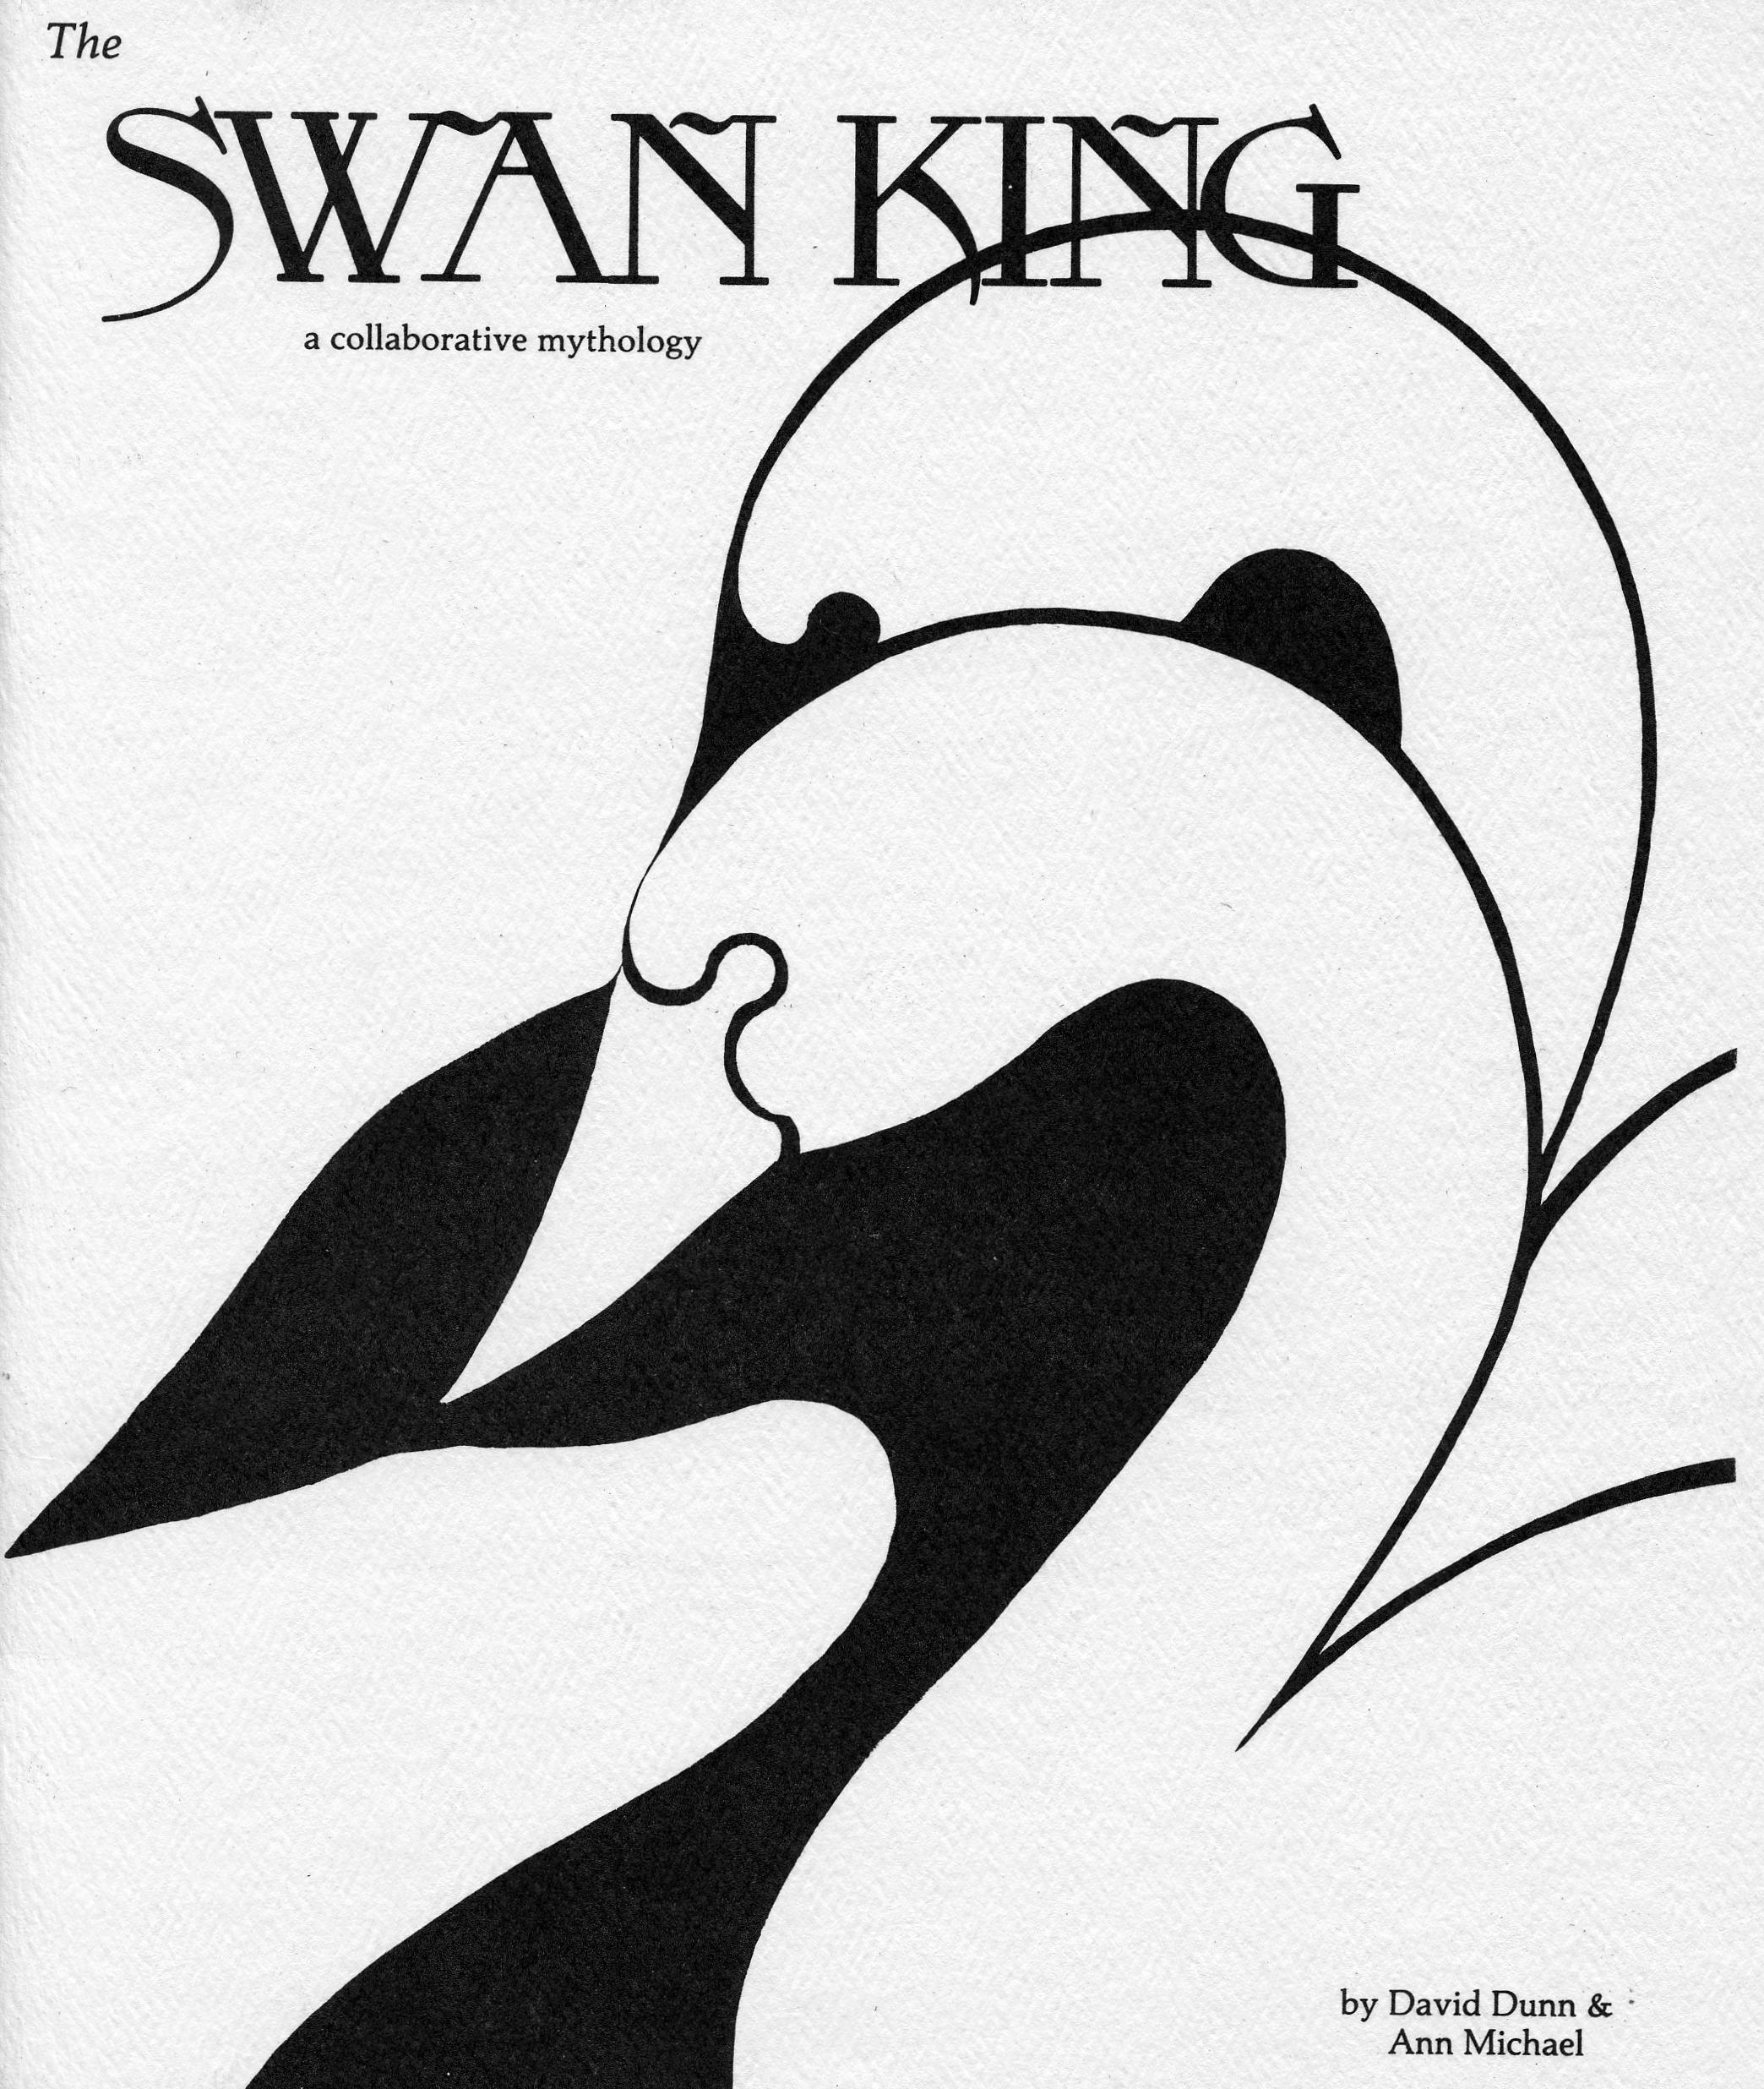 swan king001 copy